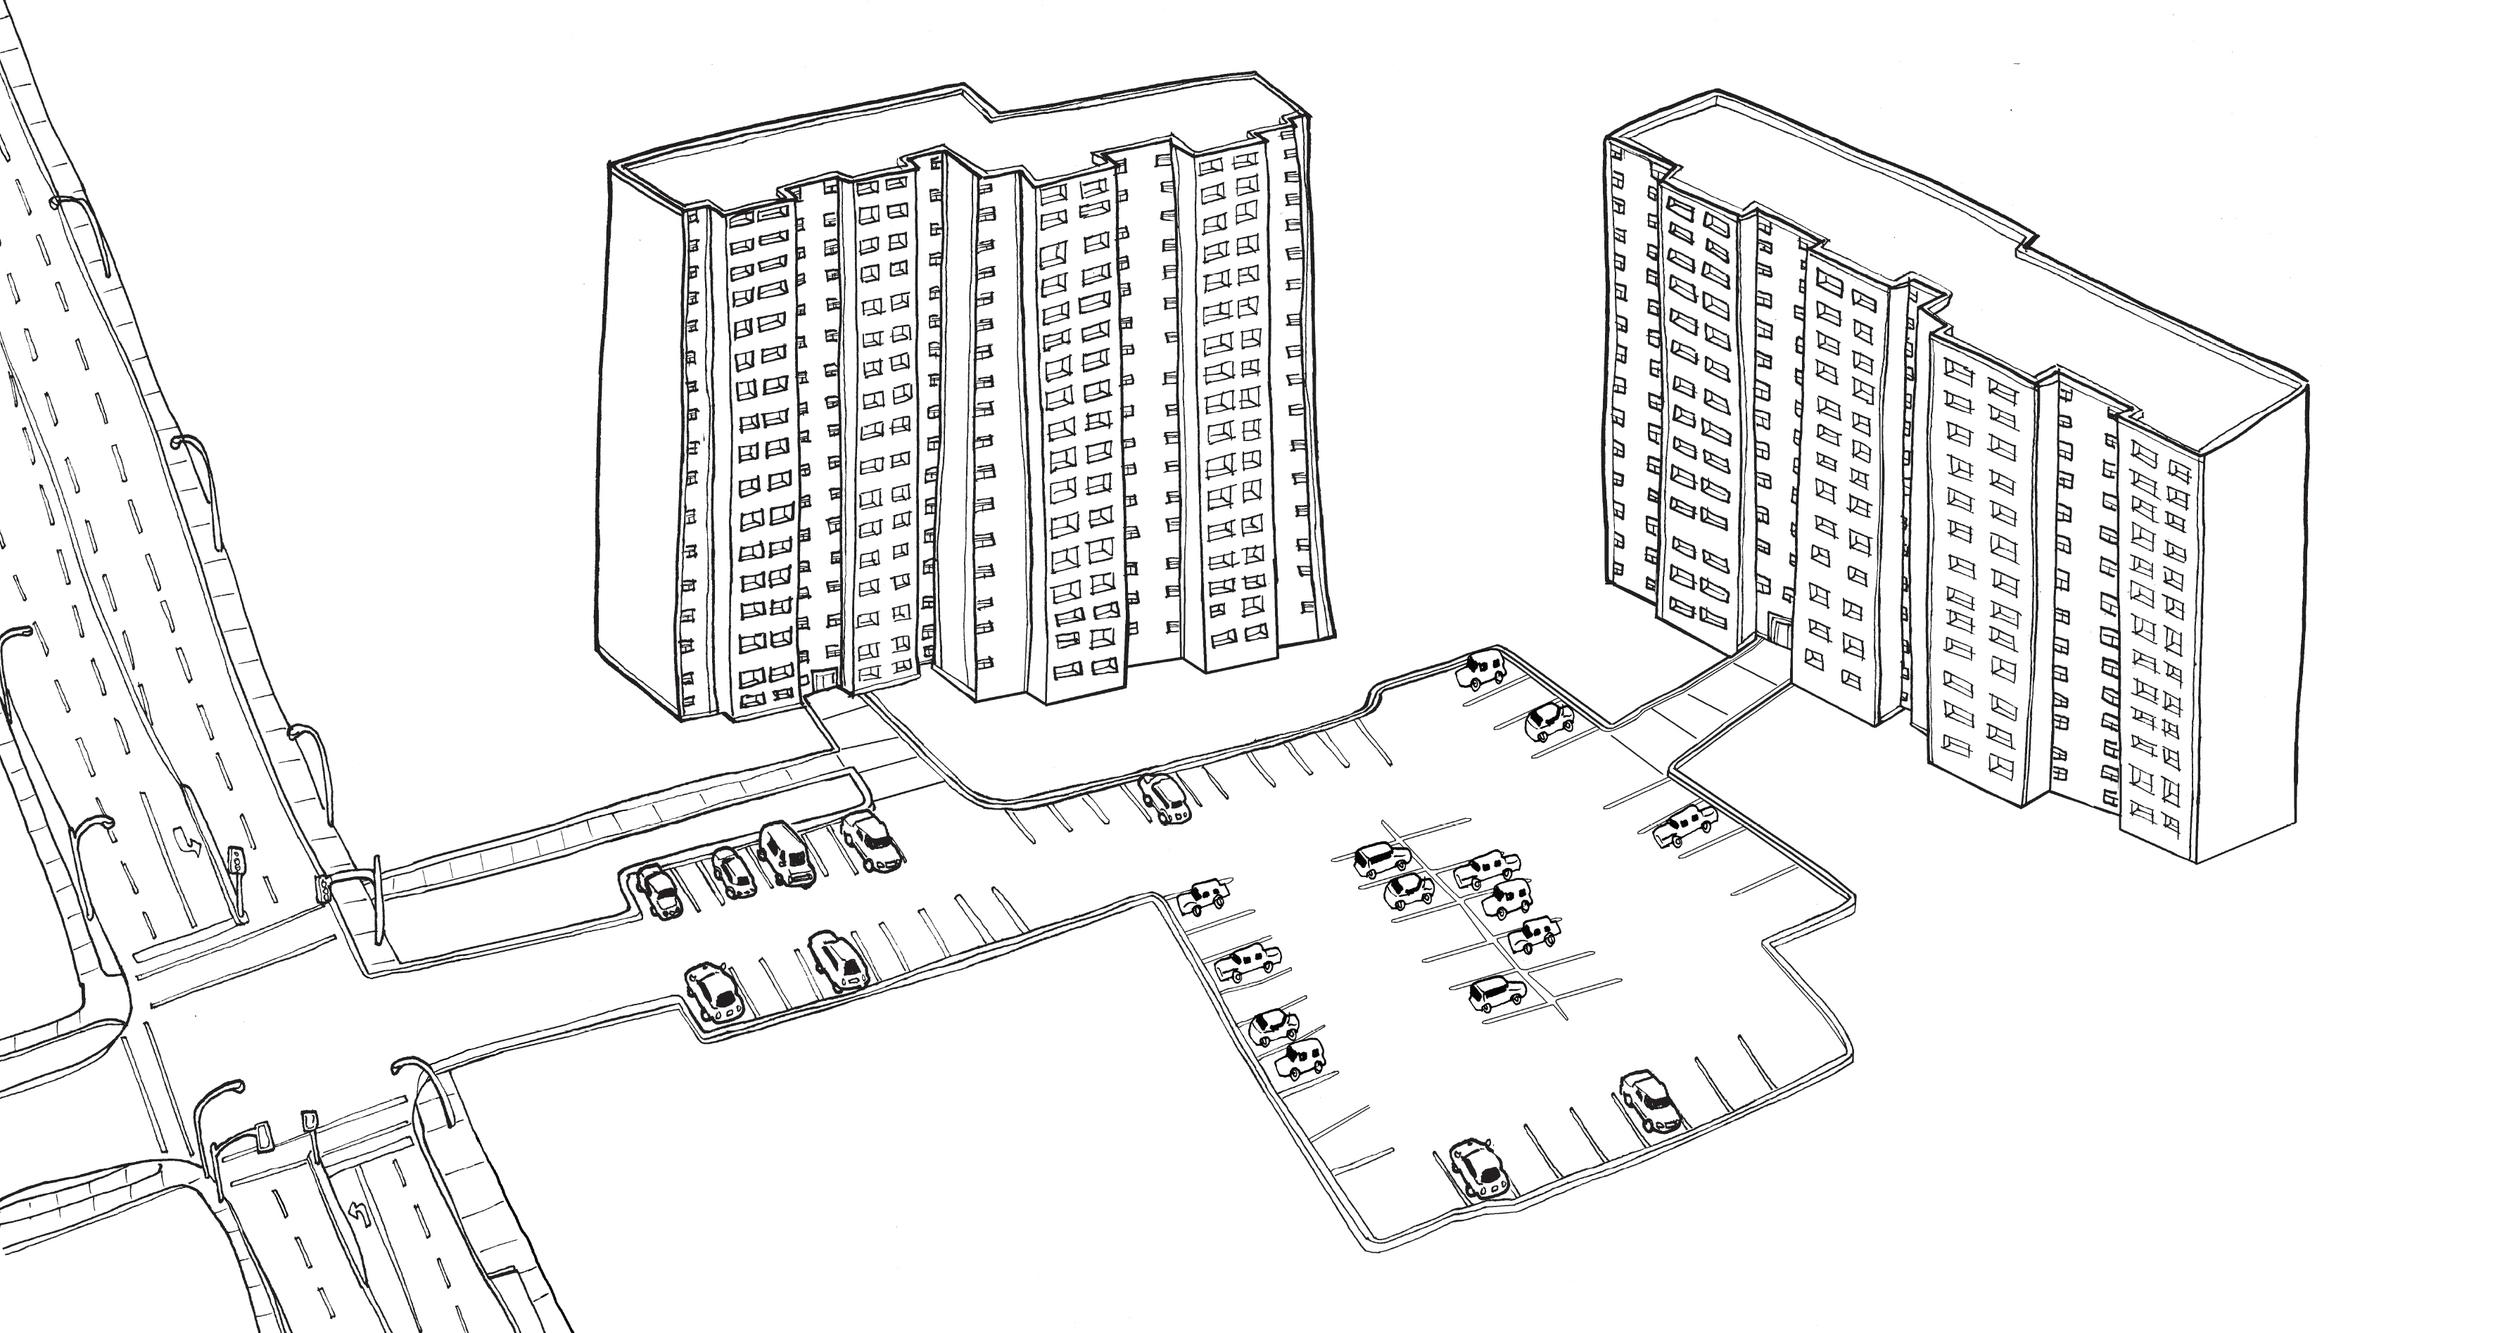 RAC ZONE Illustration1-1.jpg